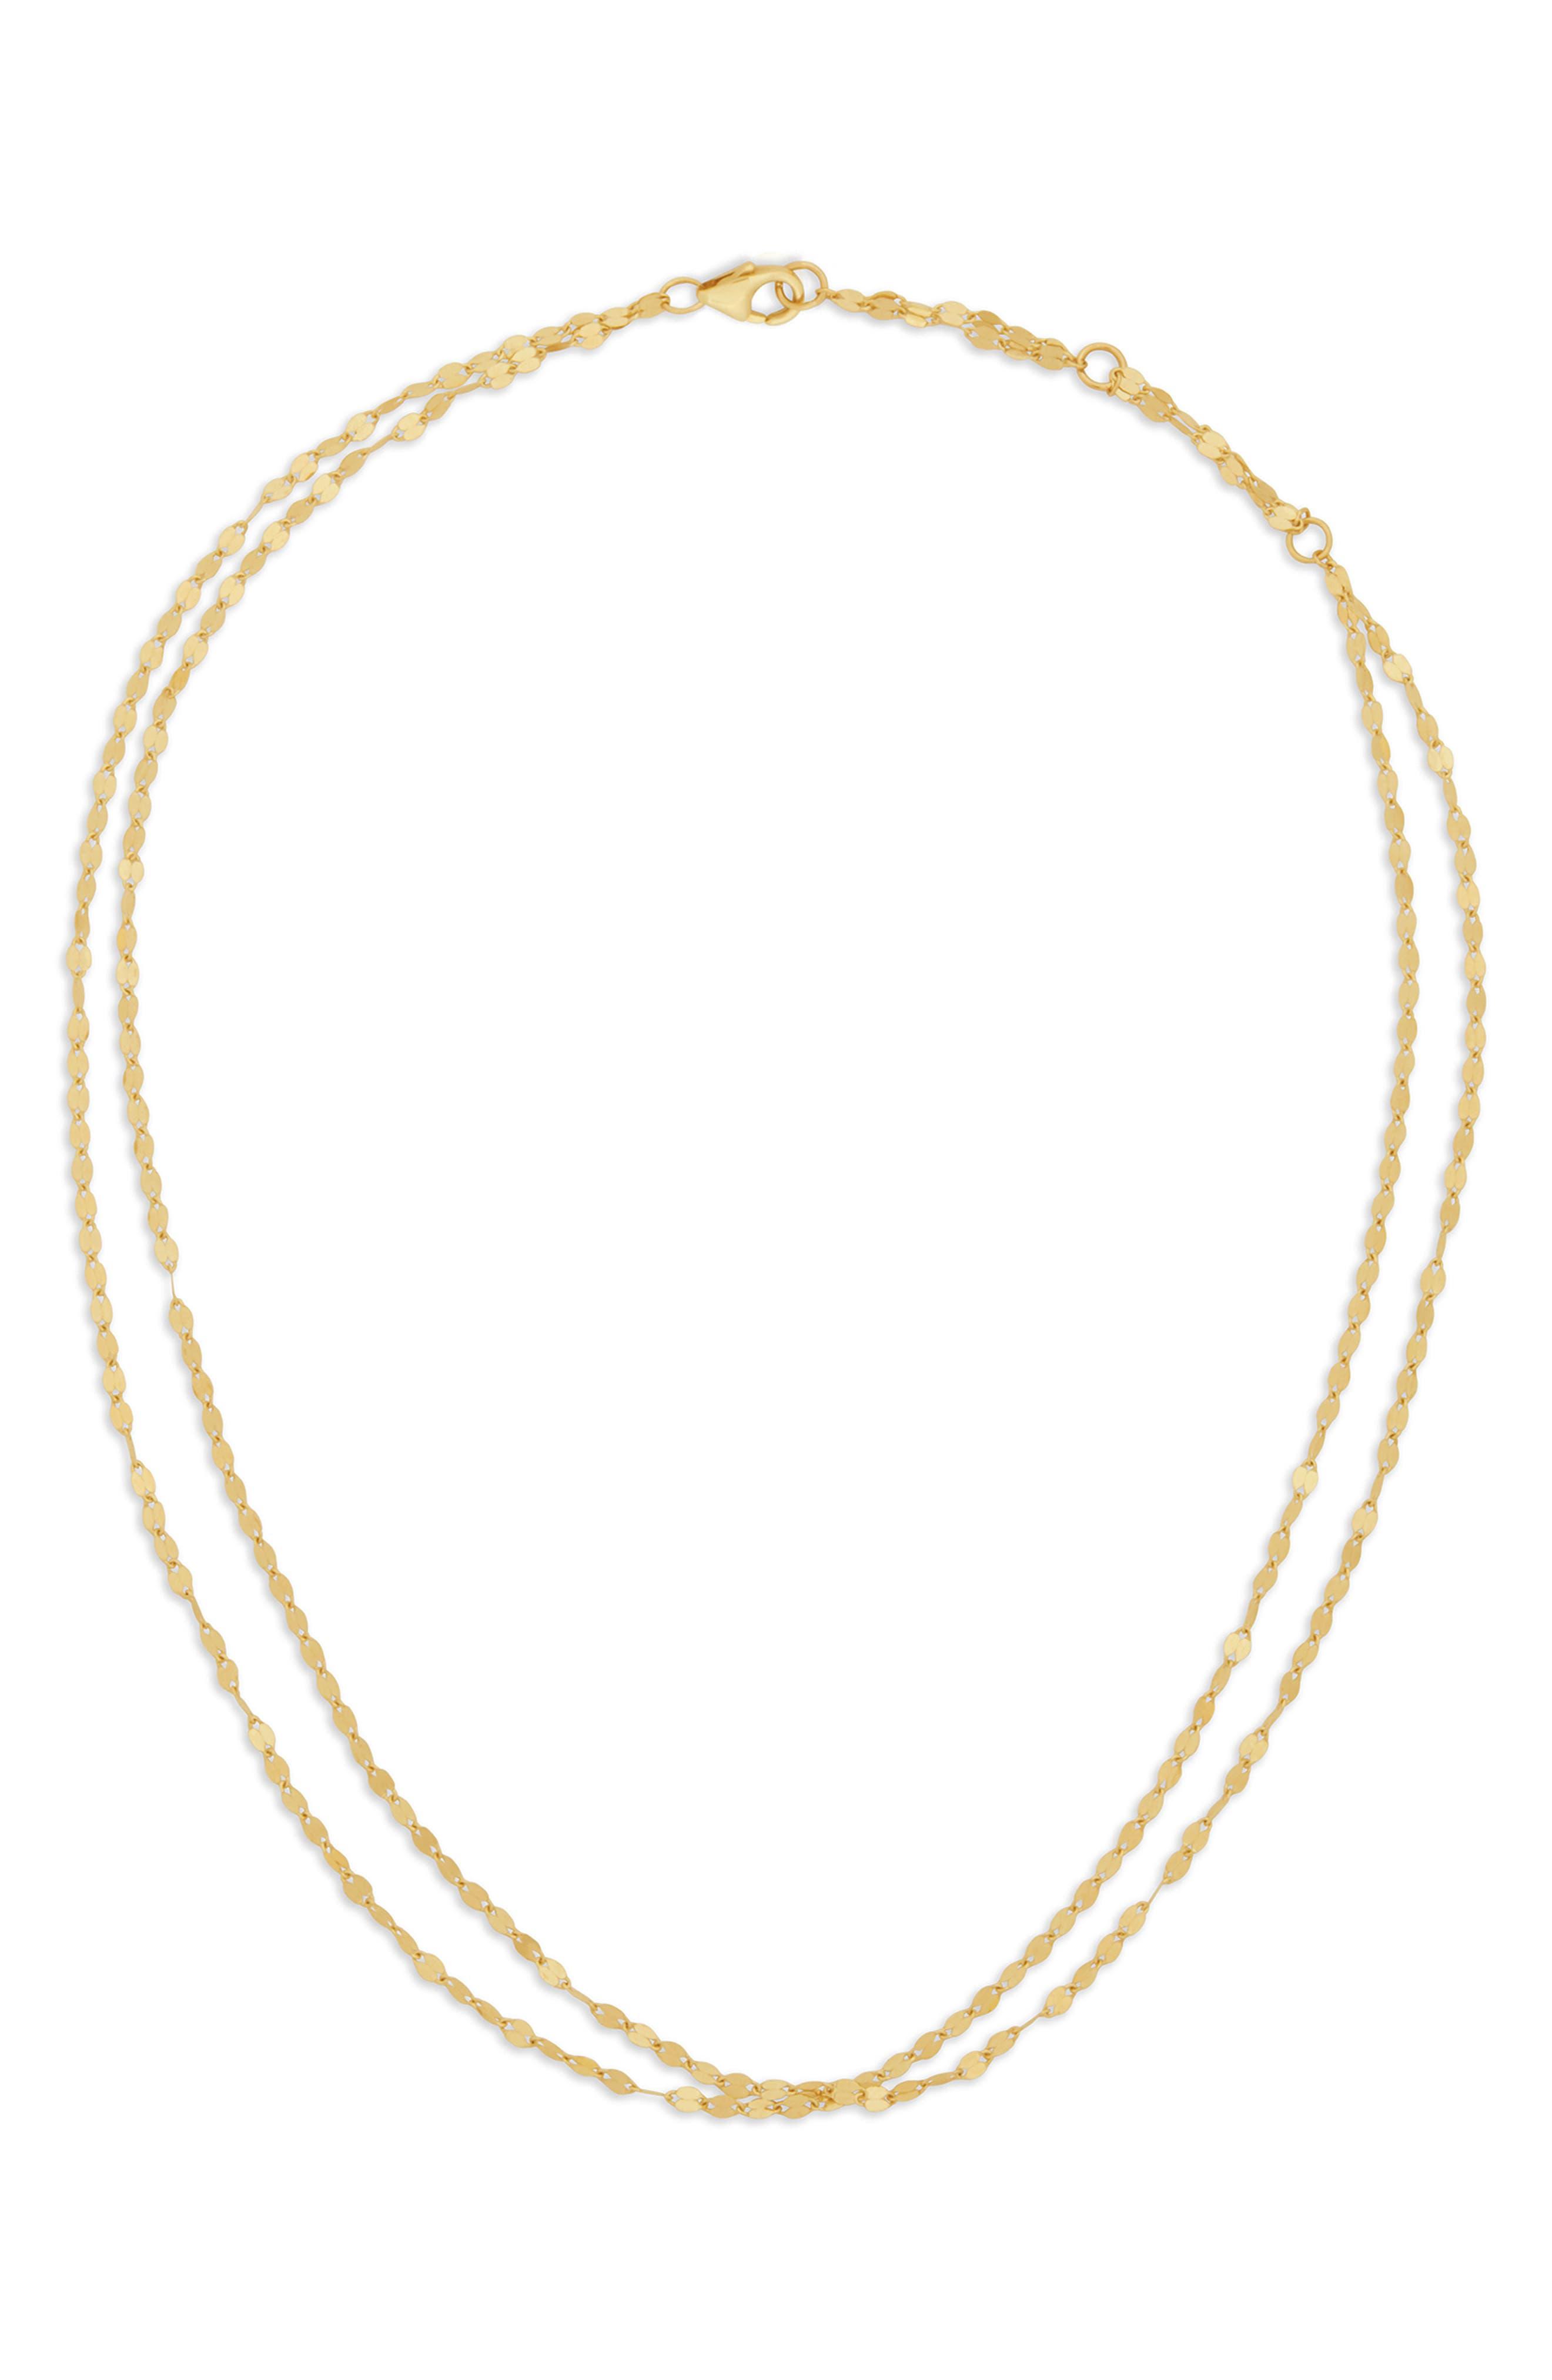 Double Blake Chain Choker Necklace